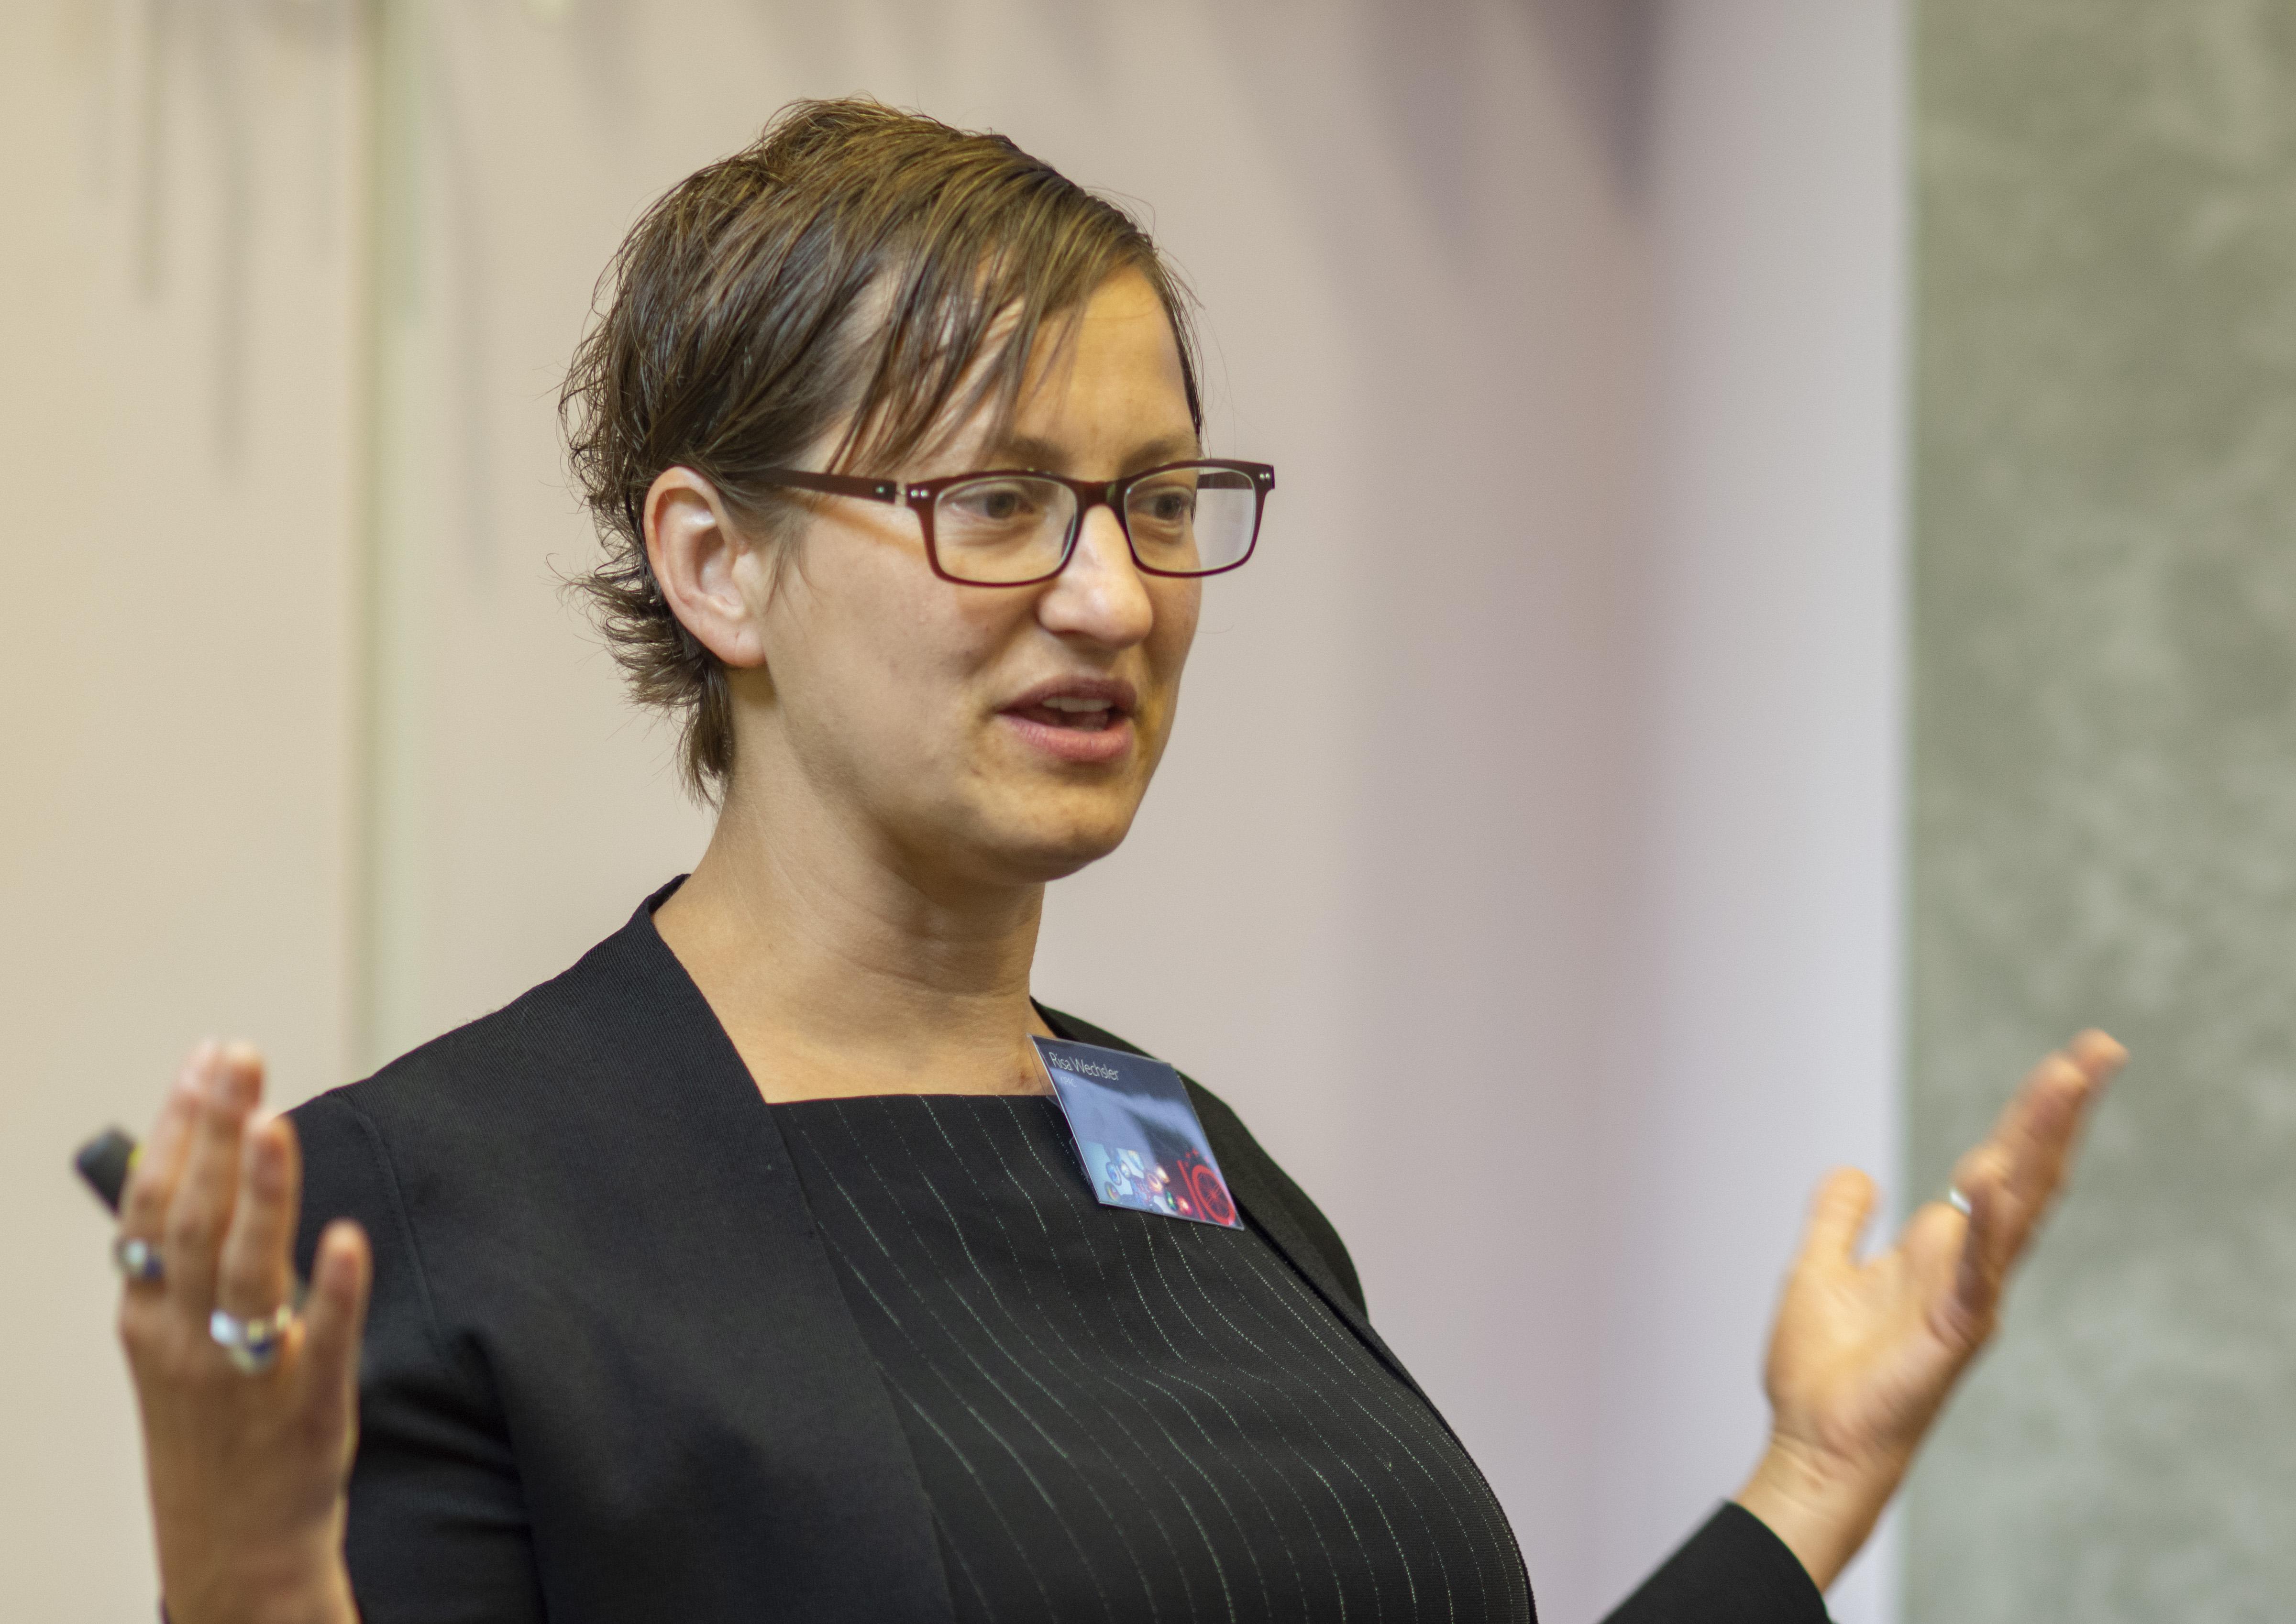 Morning presentations: Risa Wechsler